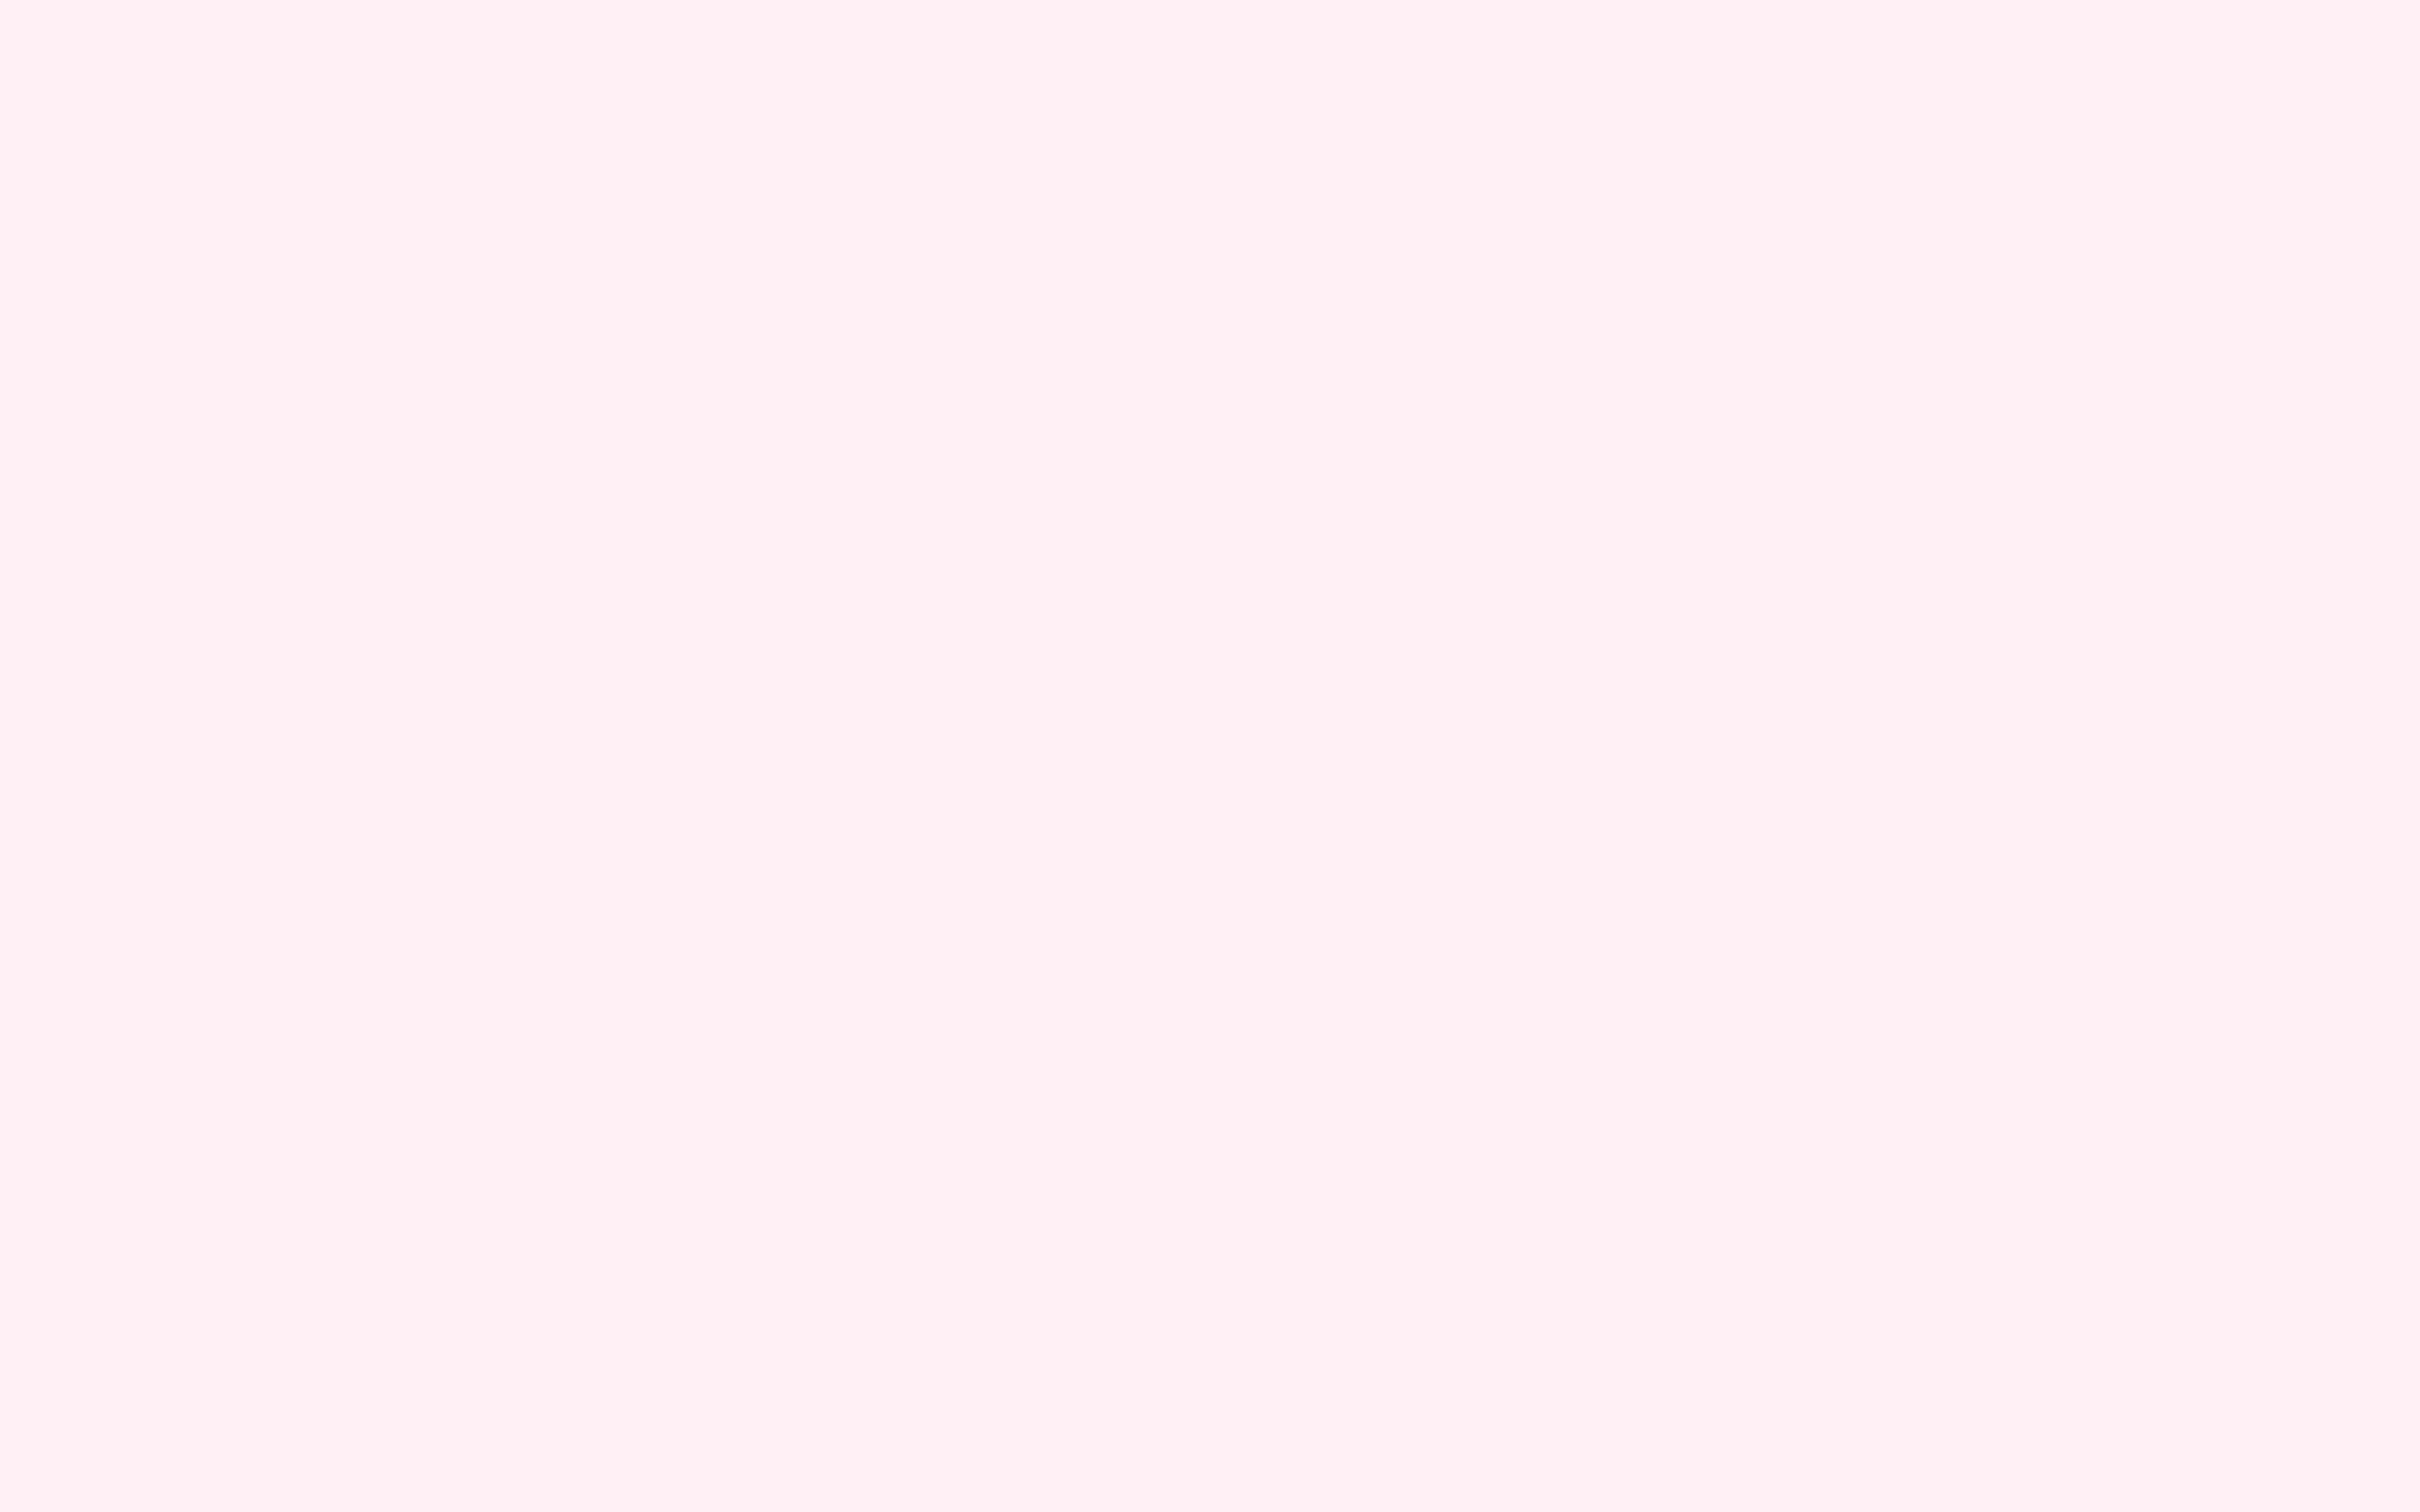 2560x1600 Lavender Blush Solid Color Background